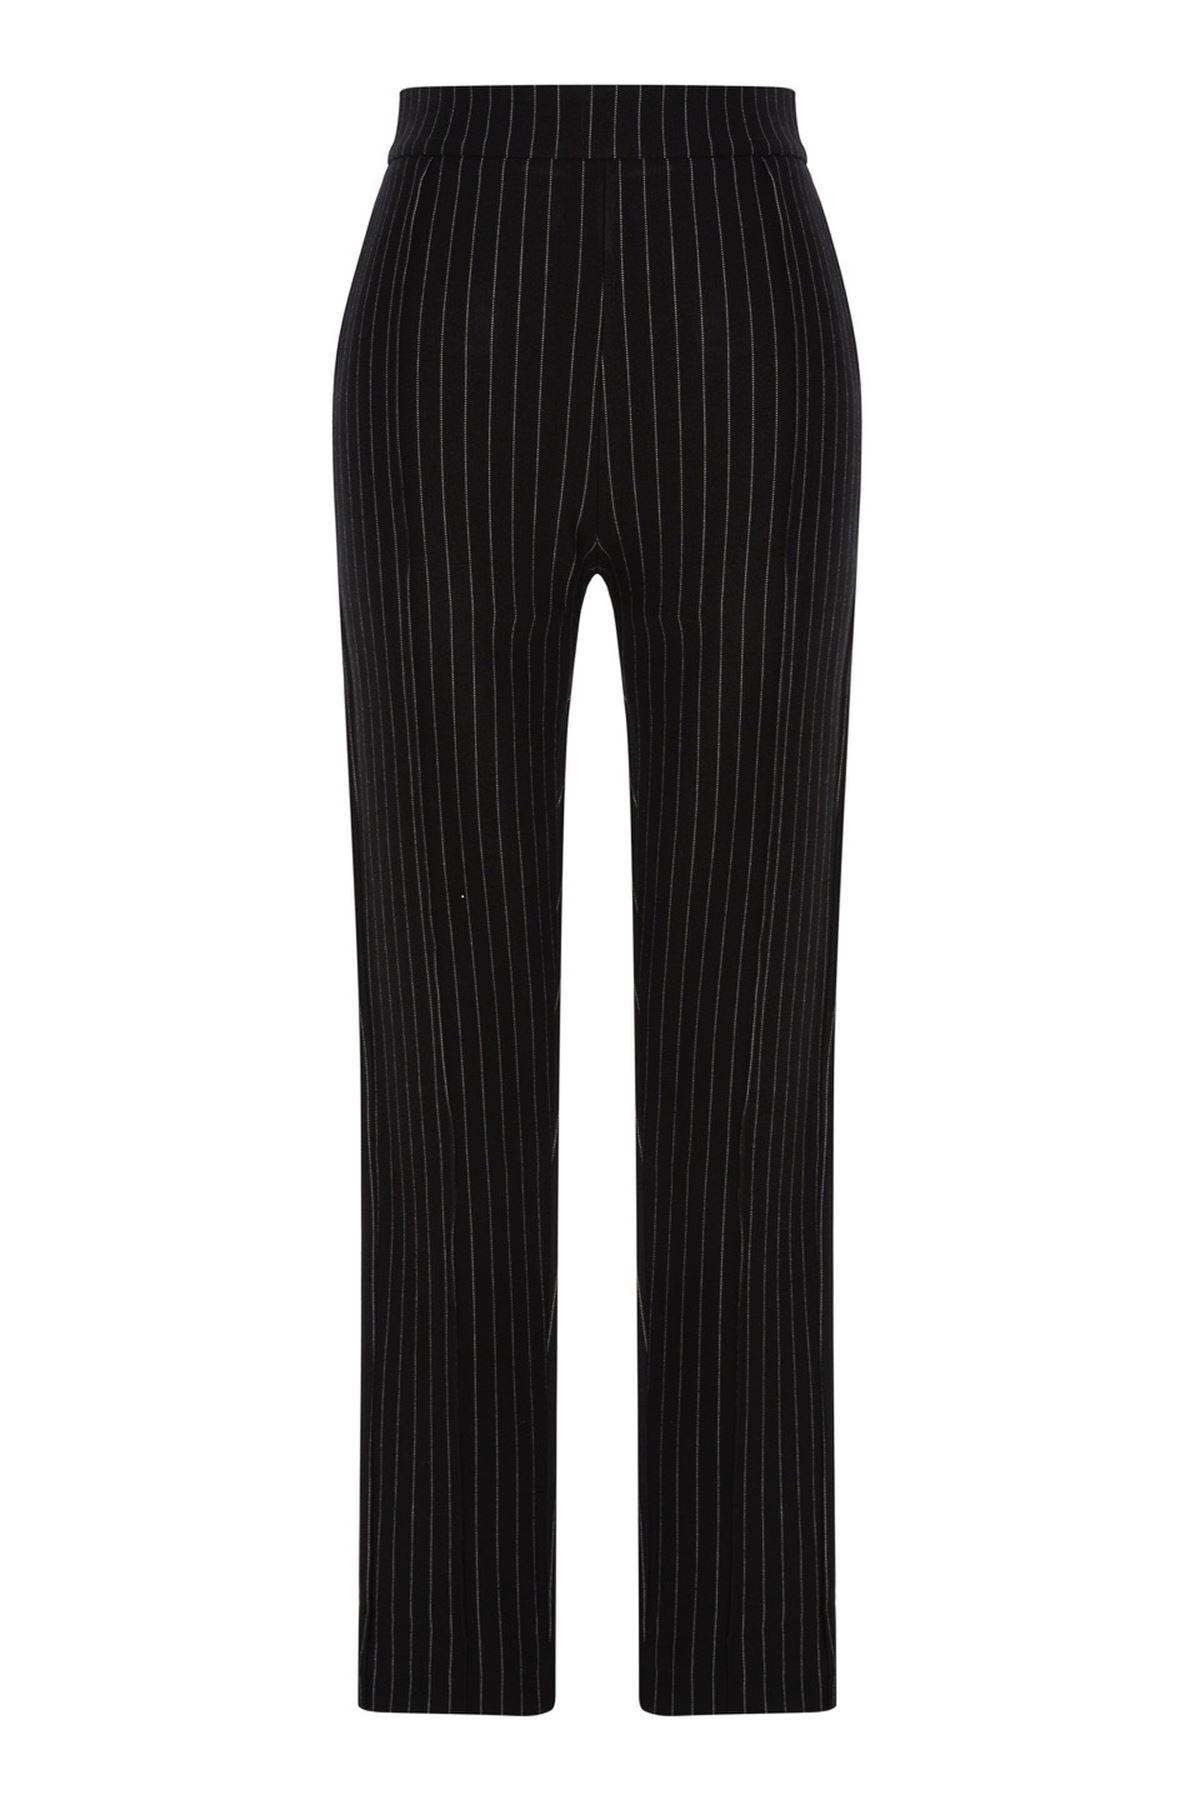 Office Skinny Pantolon